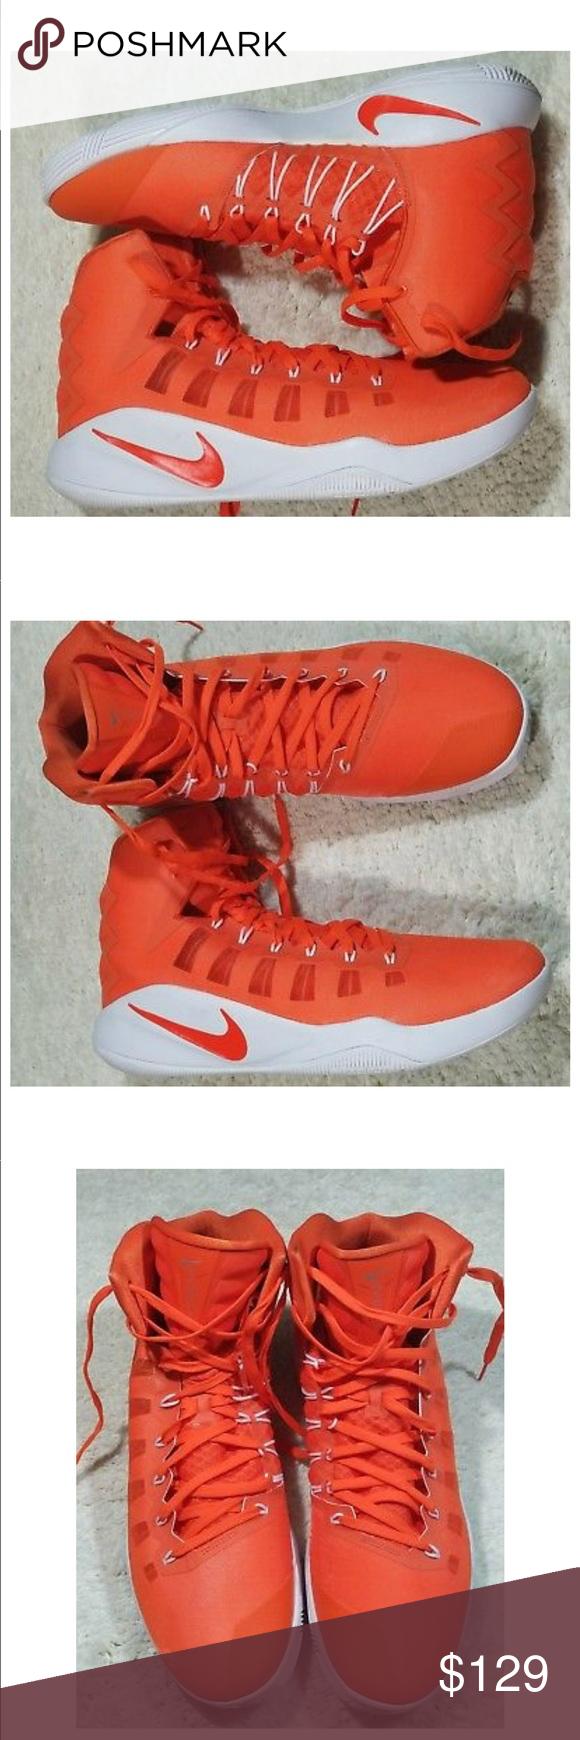 100% authentic 1e219 6f69b NEW NIKE HYPERDUNK TB PROMO BASKETBALL SHOES NEW NIKE ZOOM HYPERDUNK 2016  TB PROMO BASKETBALL SHOES ORANGE WHITE 856483-883 SZ 17. NO BOX Nike Shoes  ...